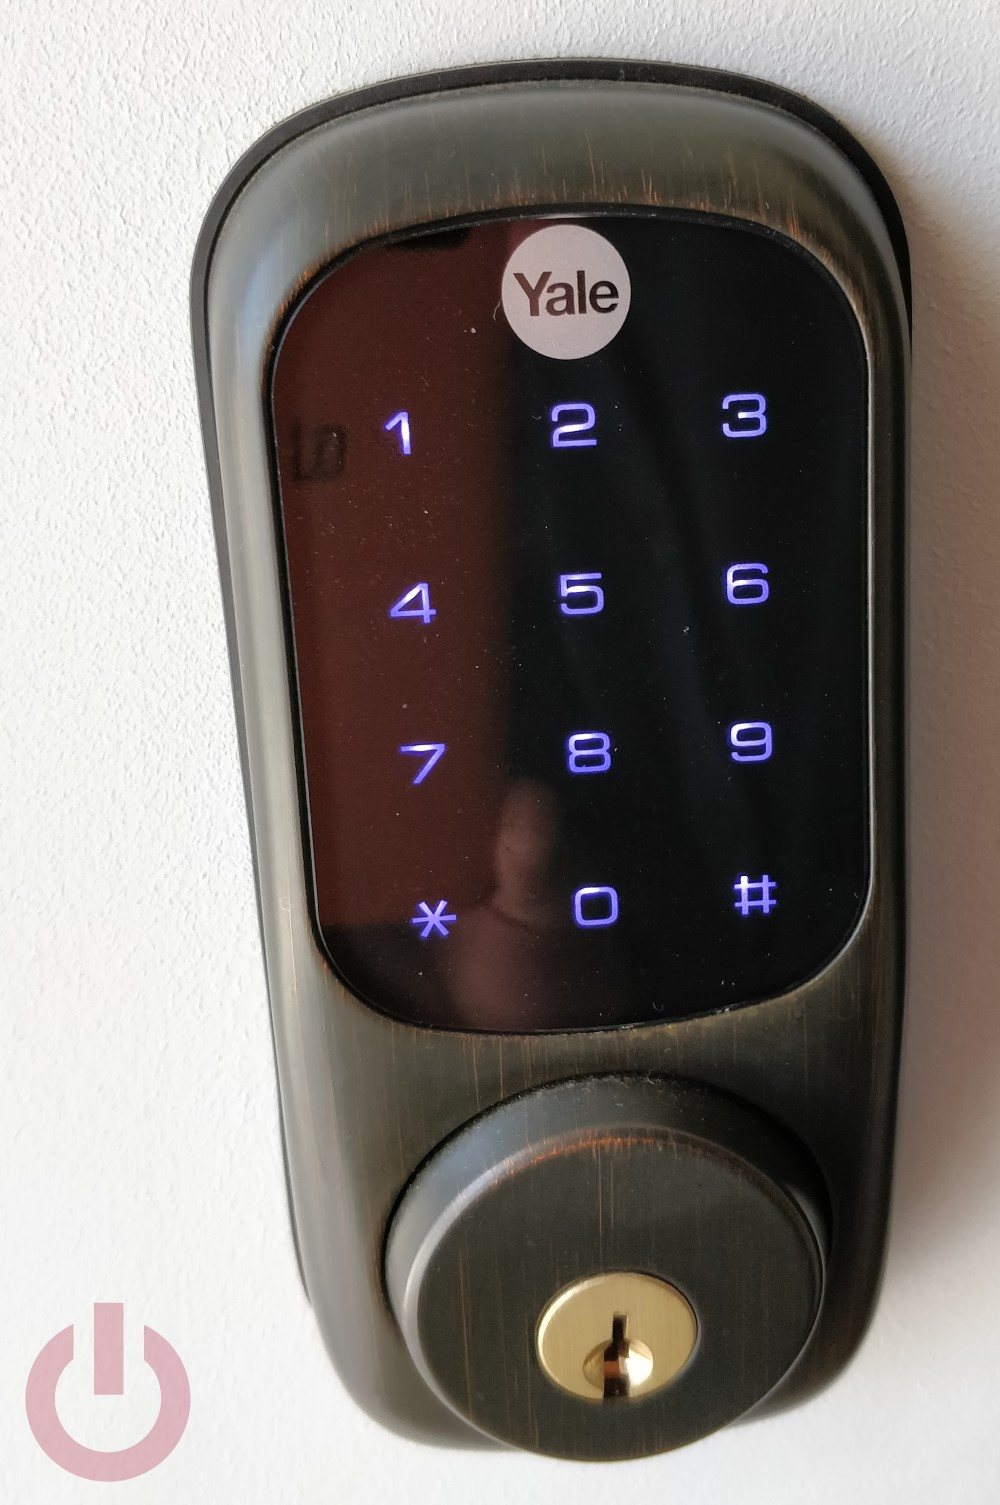 Yale Assure Lock Sl Keyless Home Automation Deadbolt